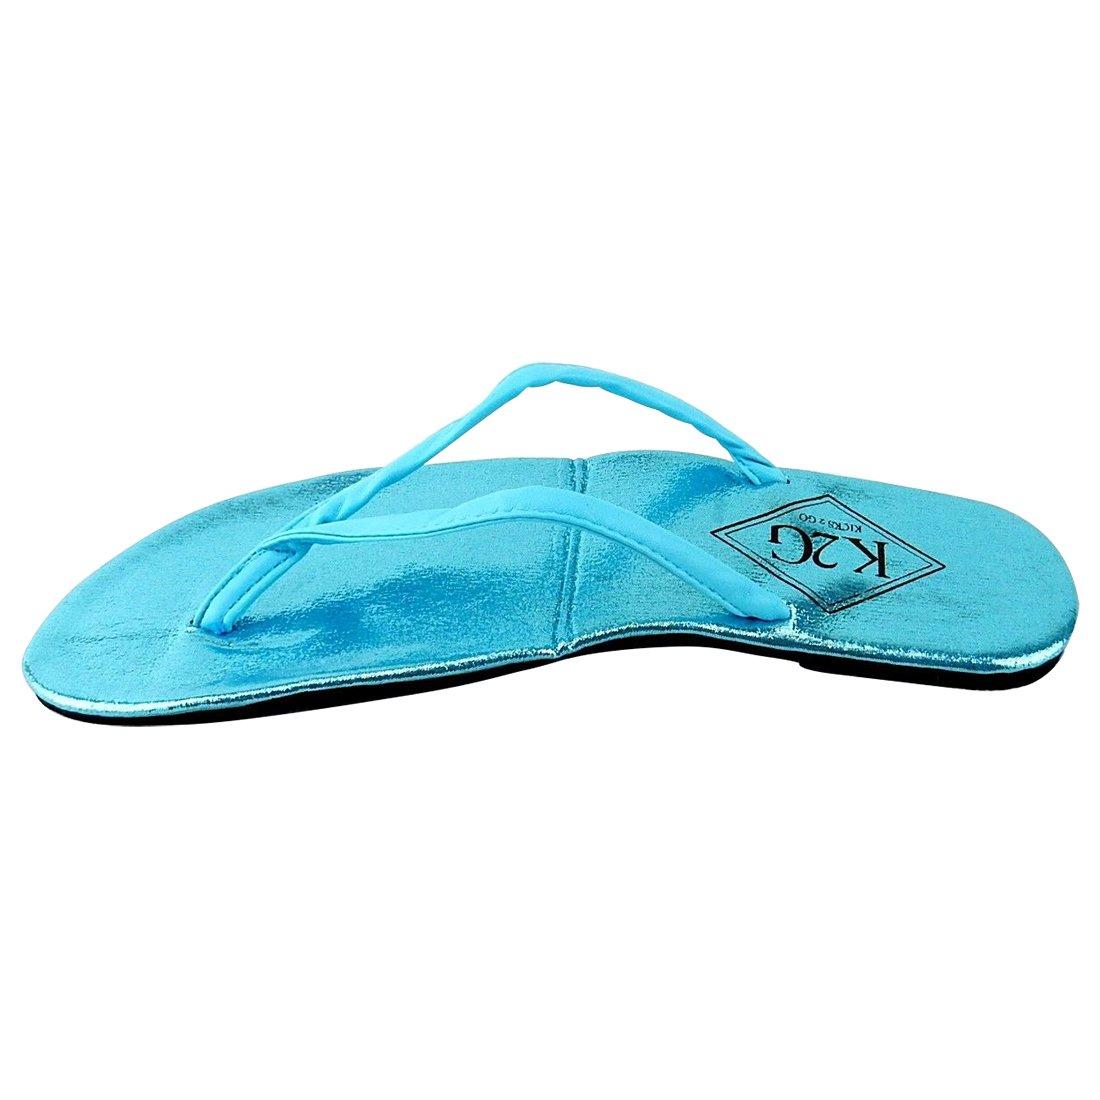 c1f4416b58e7 Amazon.com  Ladies  Folding Flip-Flops with Pouch - Spa